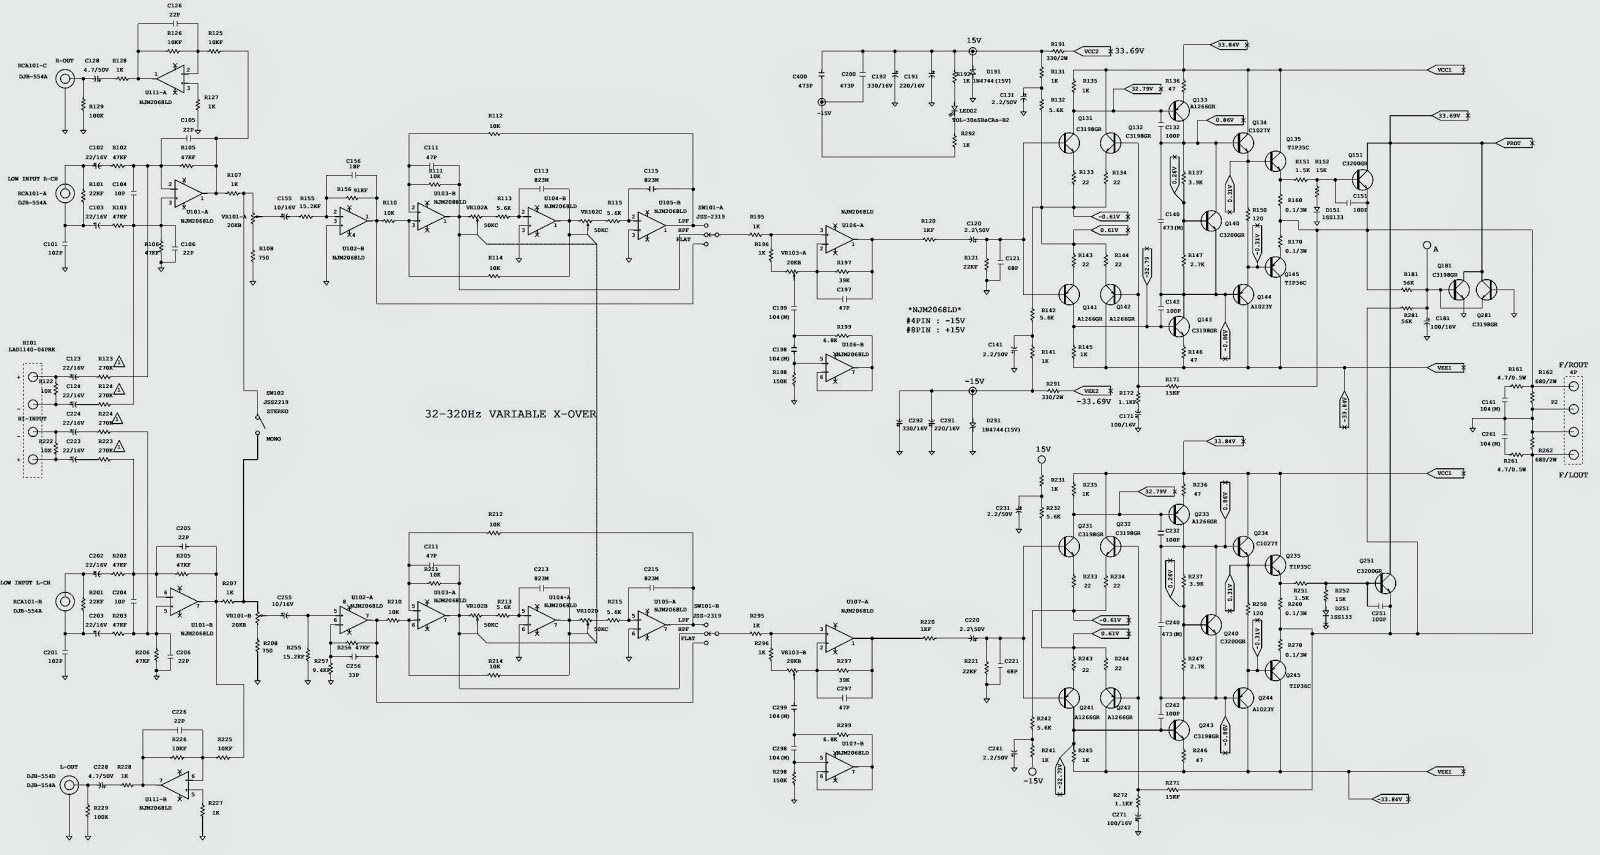 2007 toyota tundra jbl stereo wiring diagram electro help: jbl car audio gto 75.2 – wiring diagram ... jbl amplifier wiring diagram